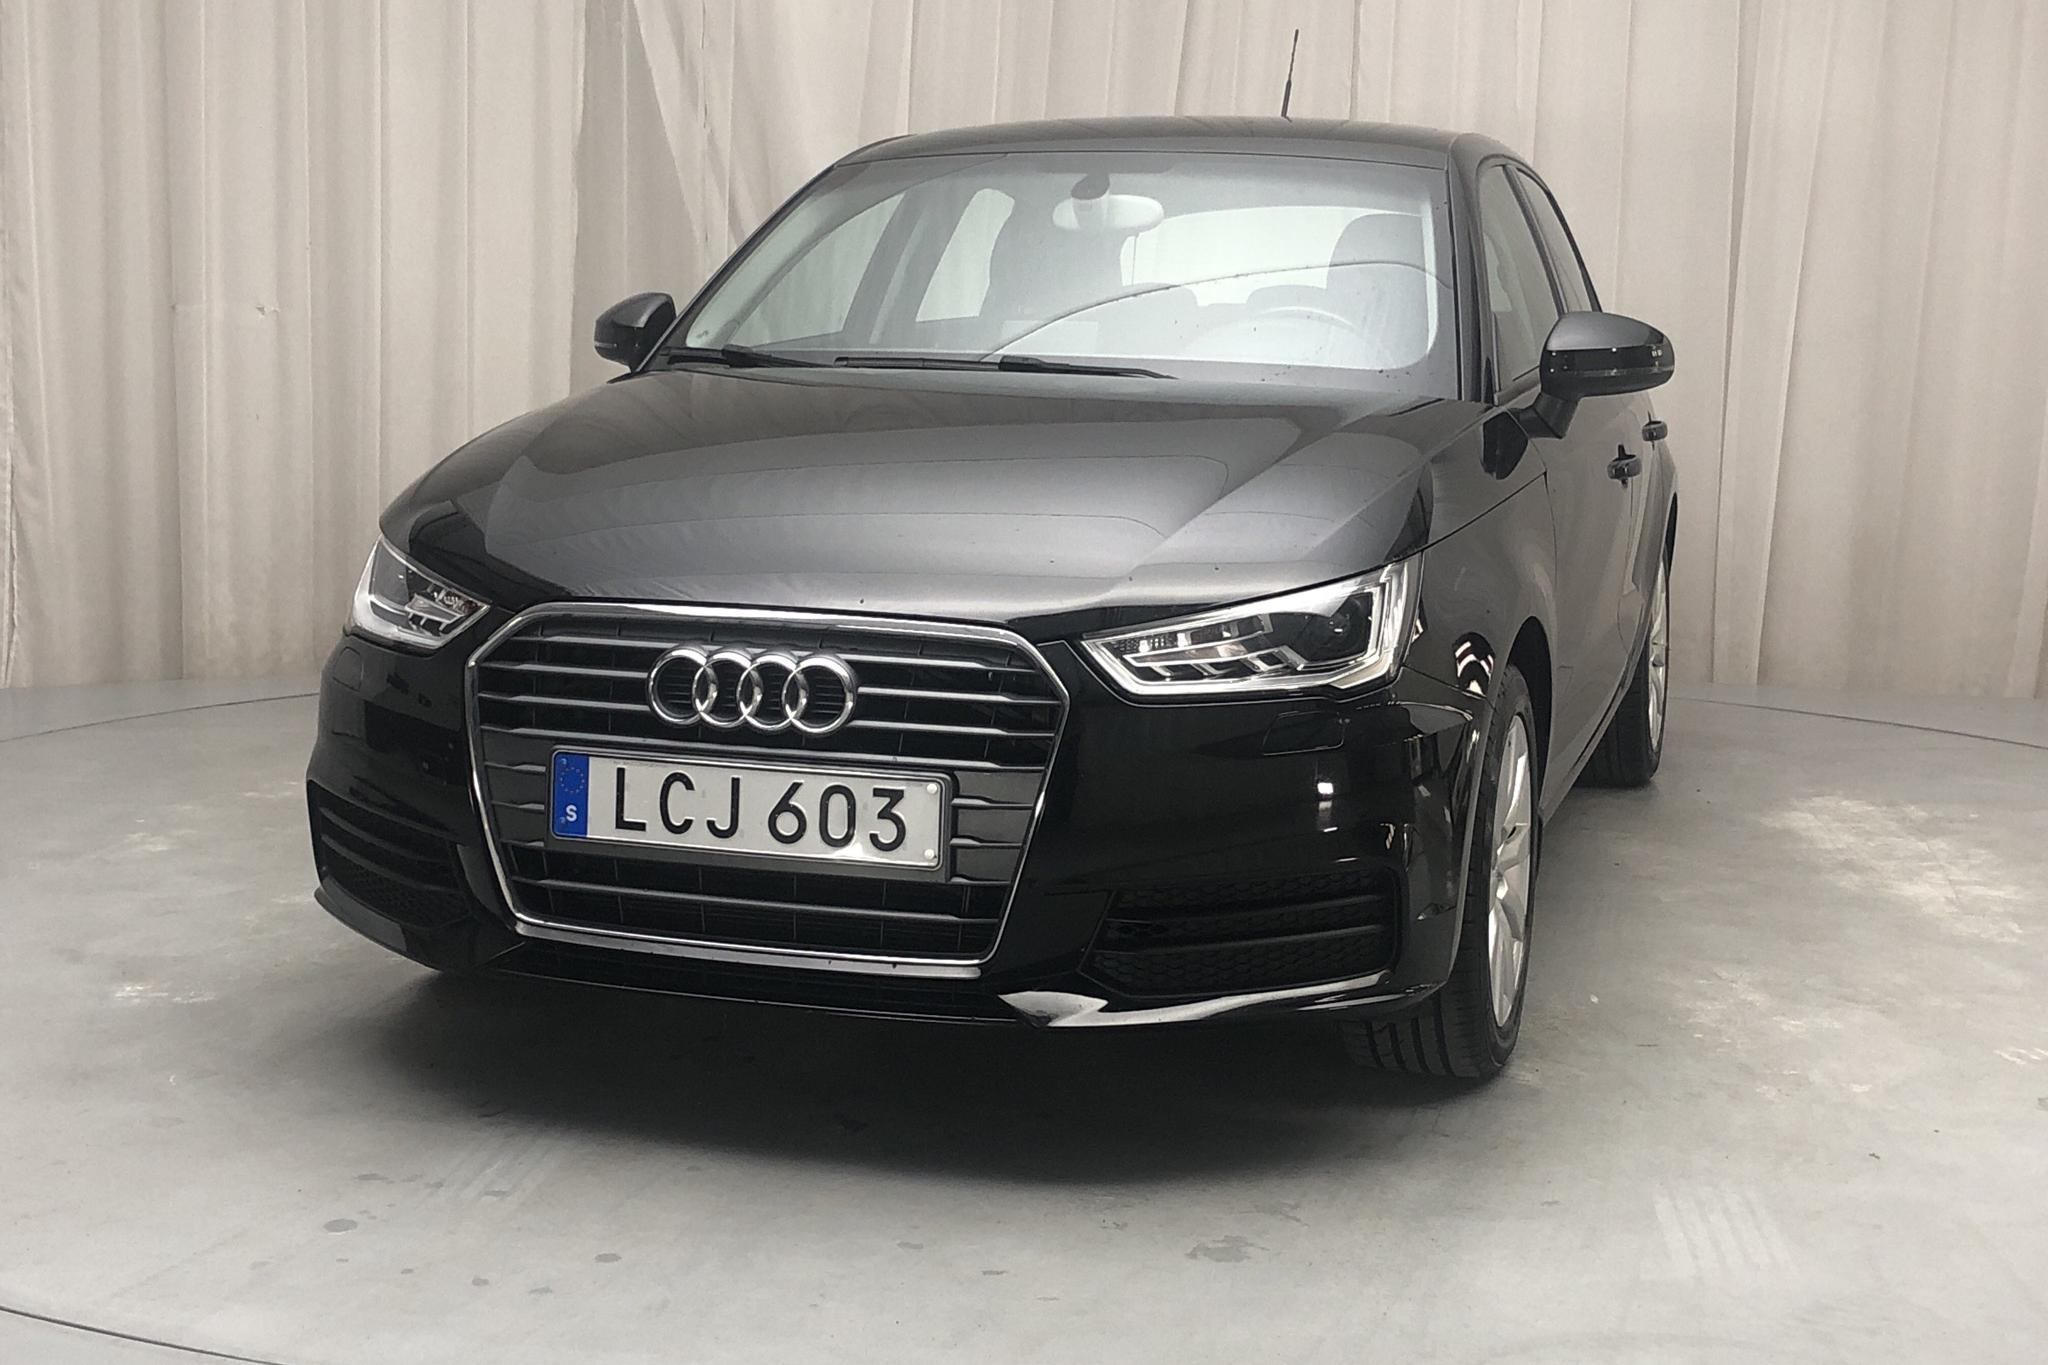 Audi A1 1.0 TFSI Sportback (95hk) - 5 088 mil - Manuell - svart - 2016